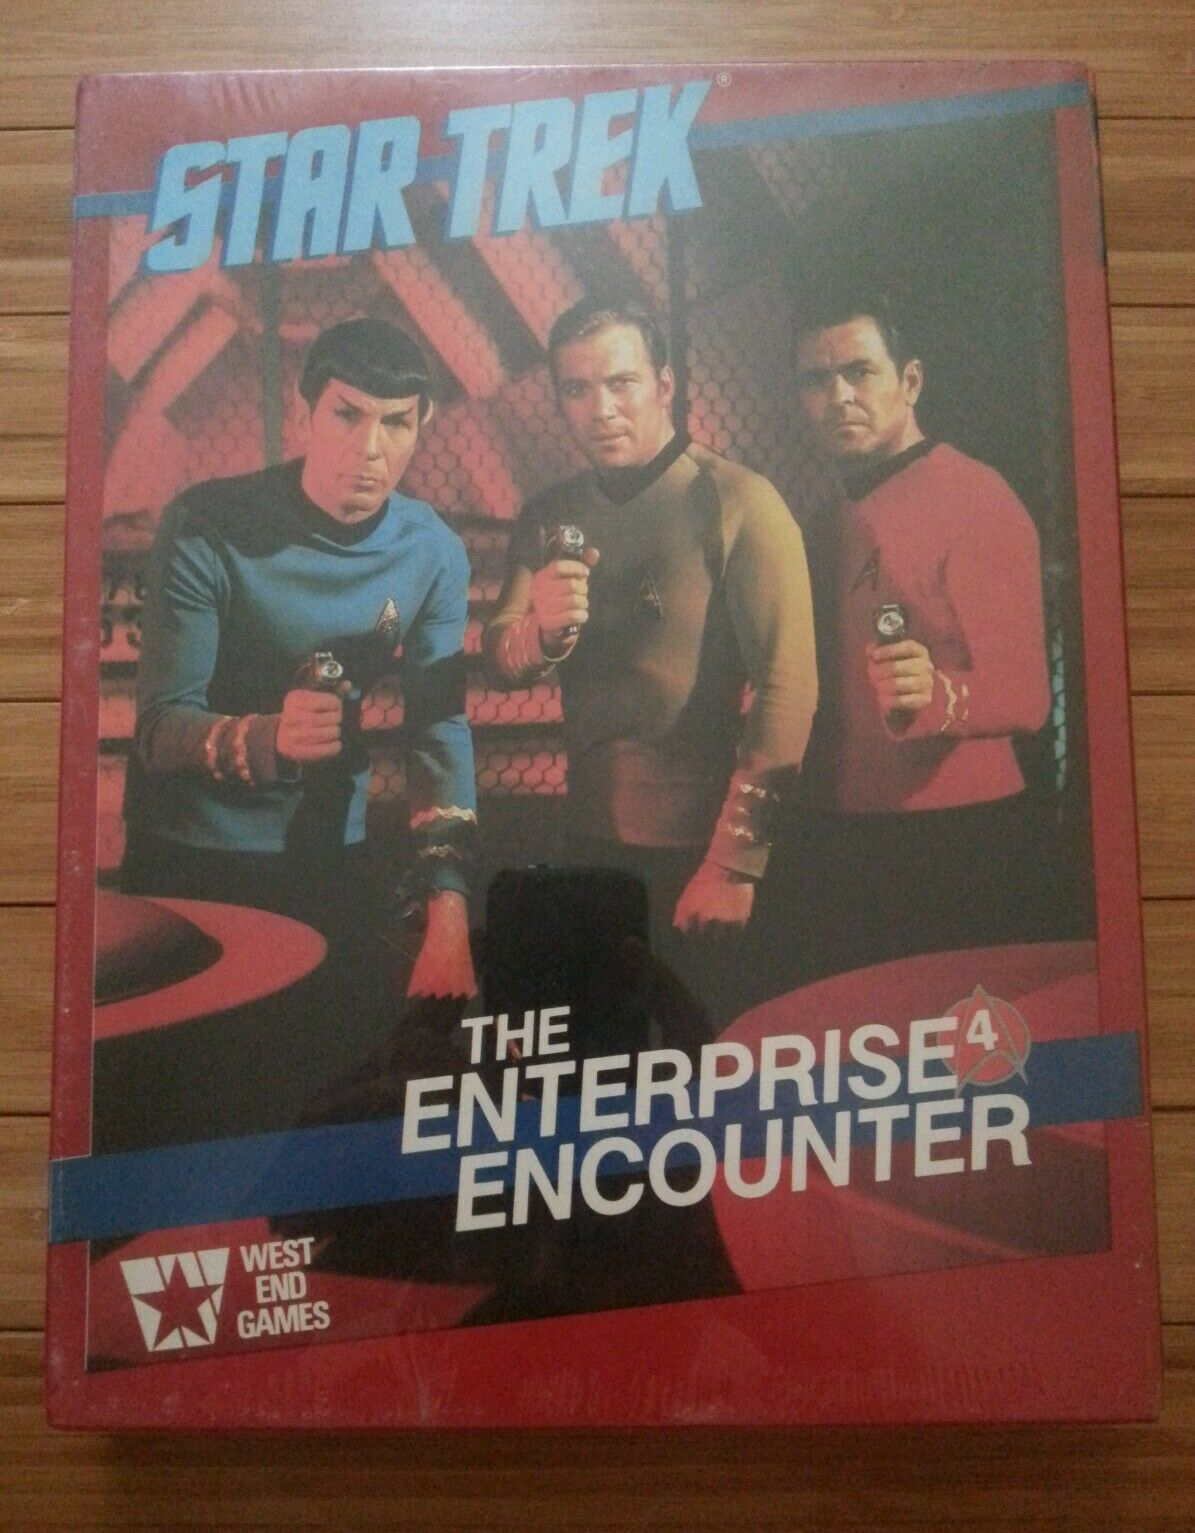 Star Trek, The Enterprise Encounter, W.E. Games, 1985 rarità in shrink